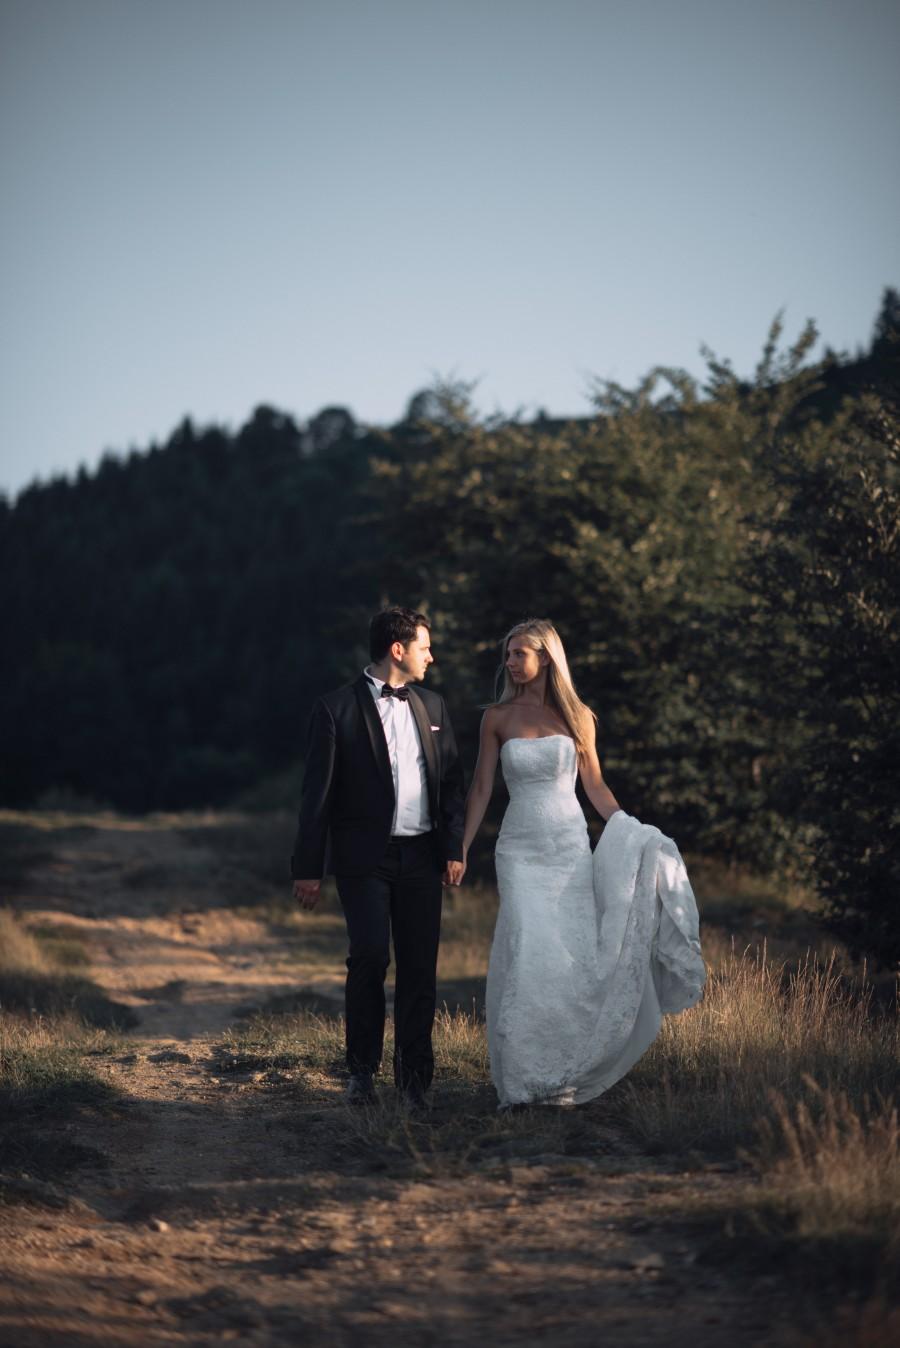 wedding+cluj+napoca+radubenjamin_149